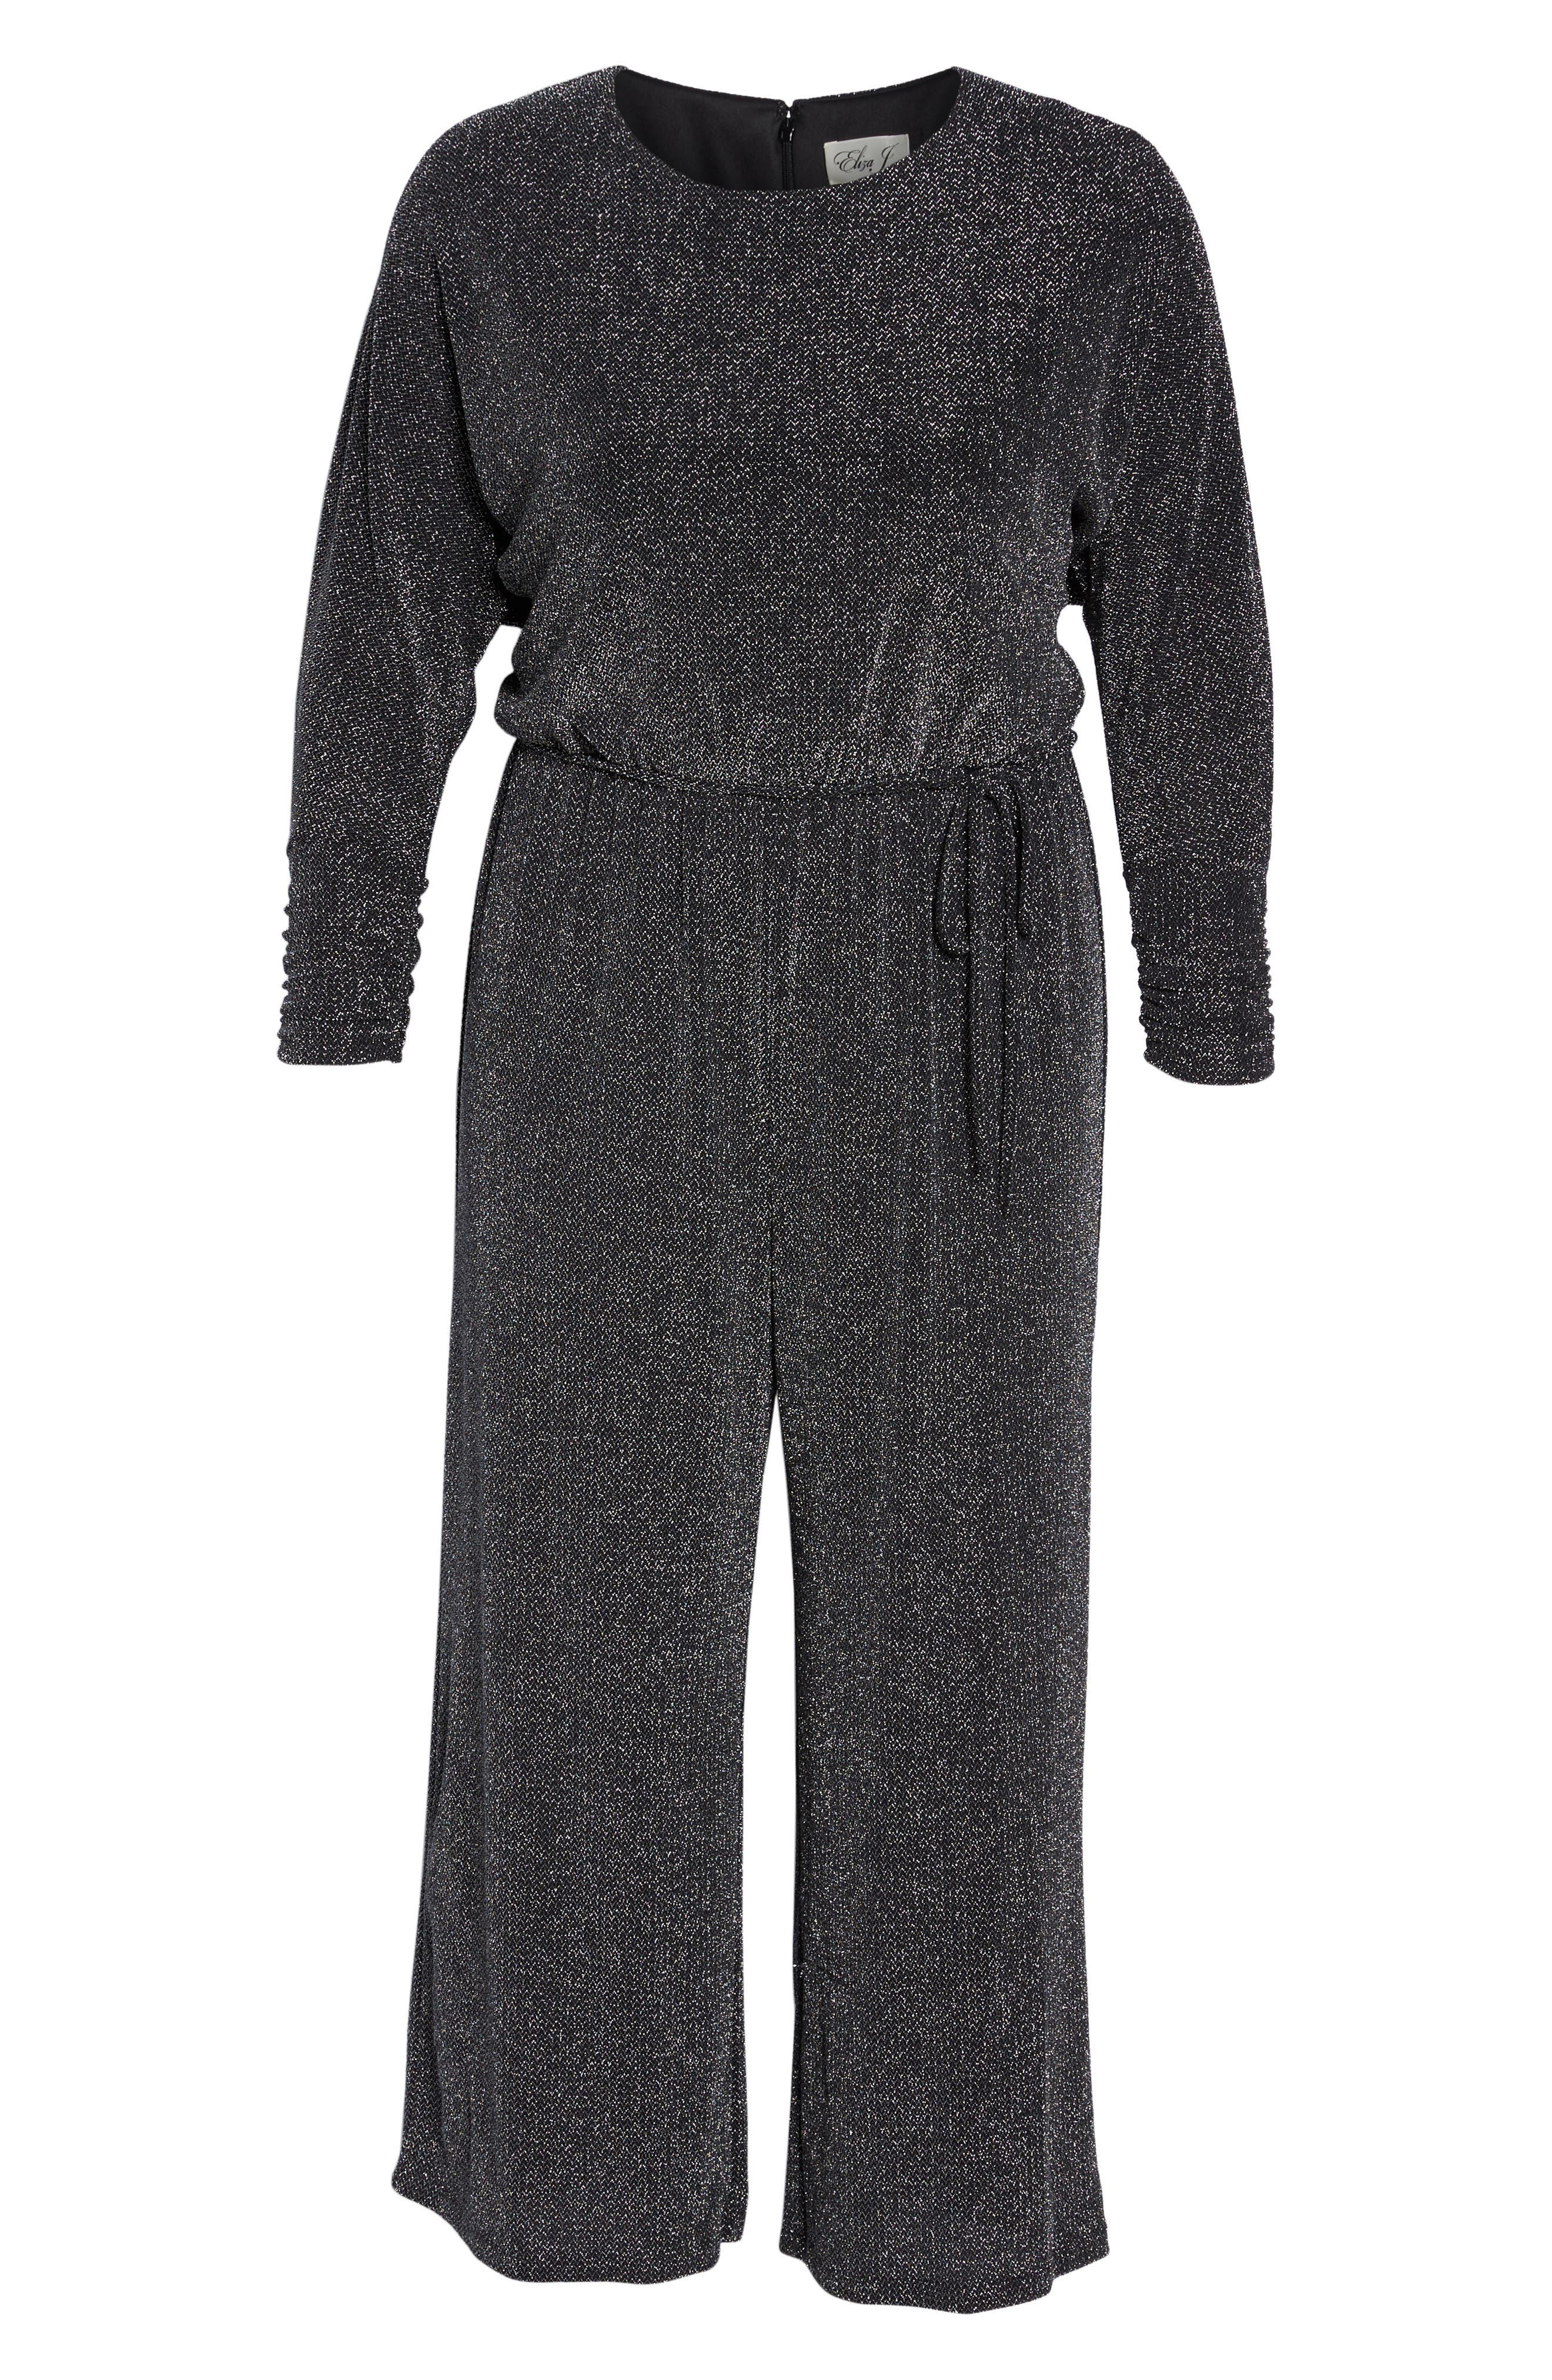 Metallic Knit Jumpsuit,                             Alternate thumbnail 6, color,                             Black/ Silver